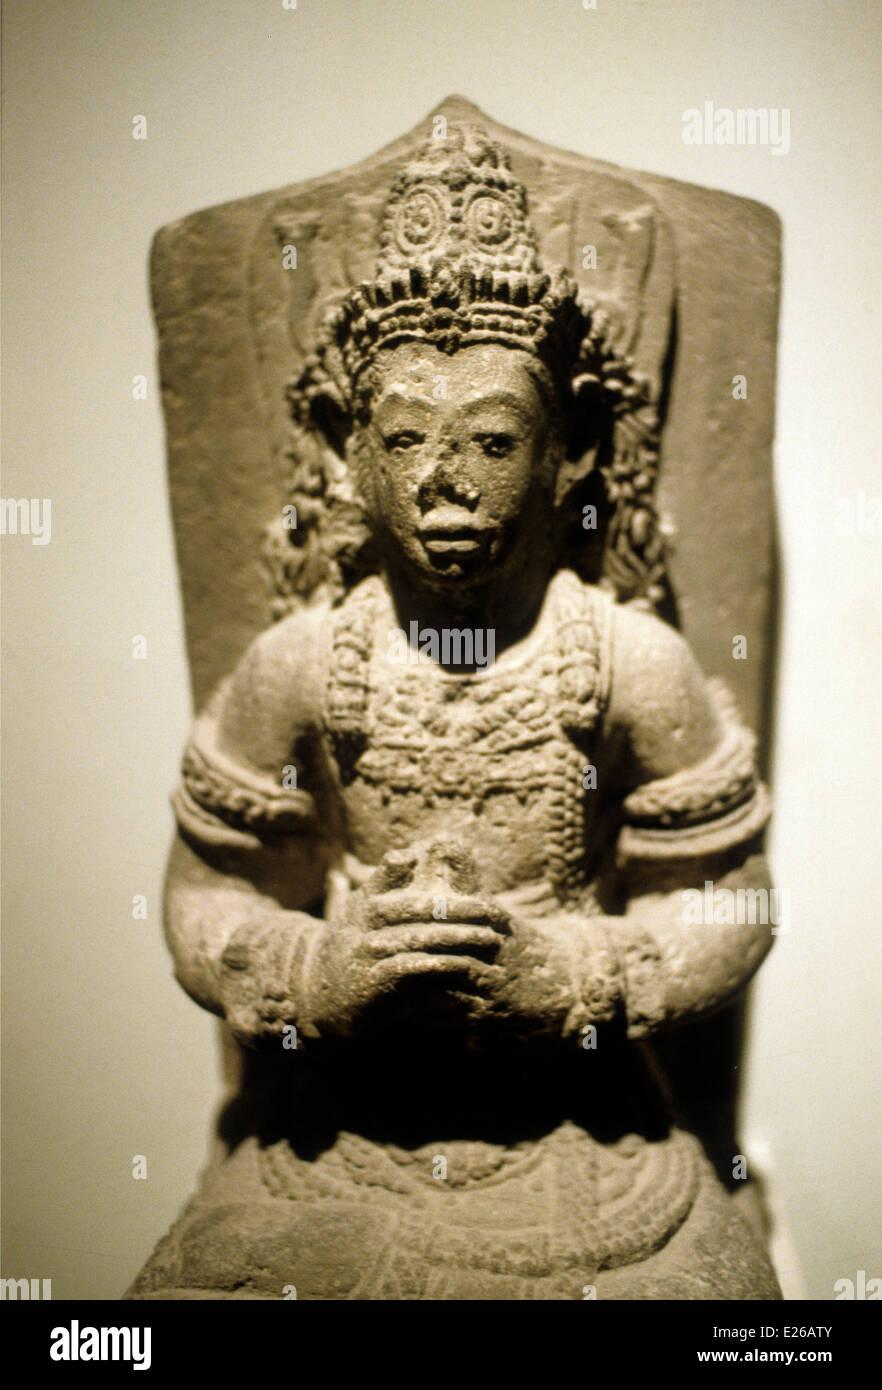 Art of the island of java,funerary statue of the late 14th century,Guimet Museum,Paris - Stock Image